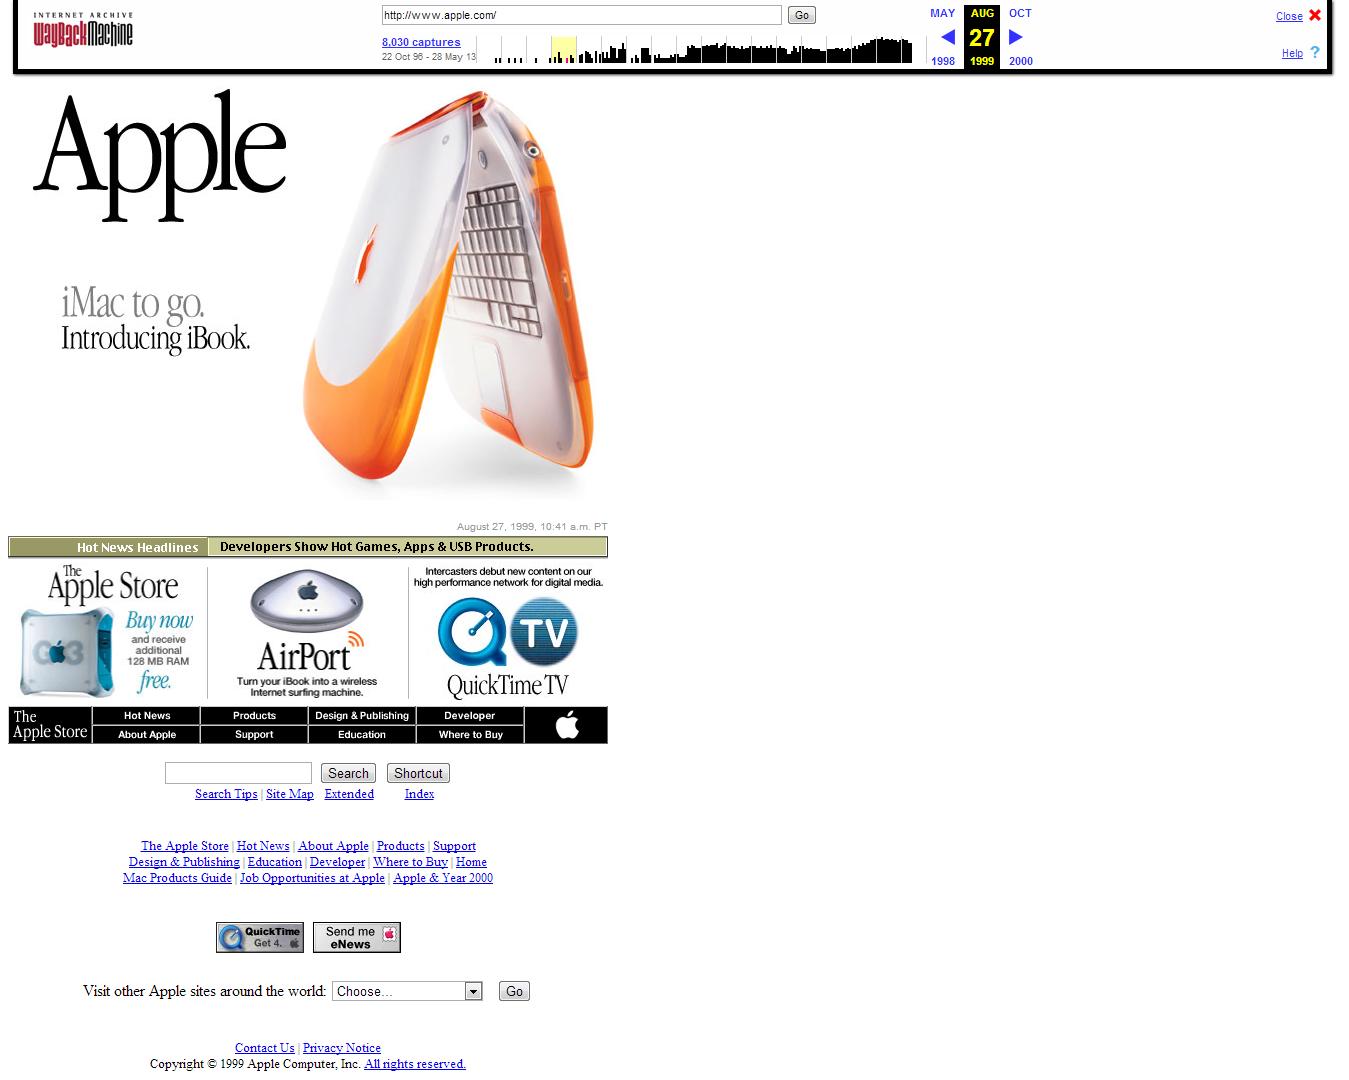 Apple Waybeck Machine - AUG 27 1999 - Apple Computer